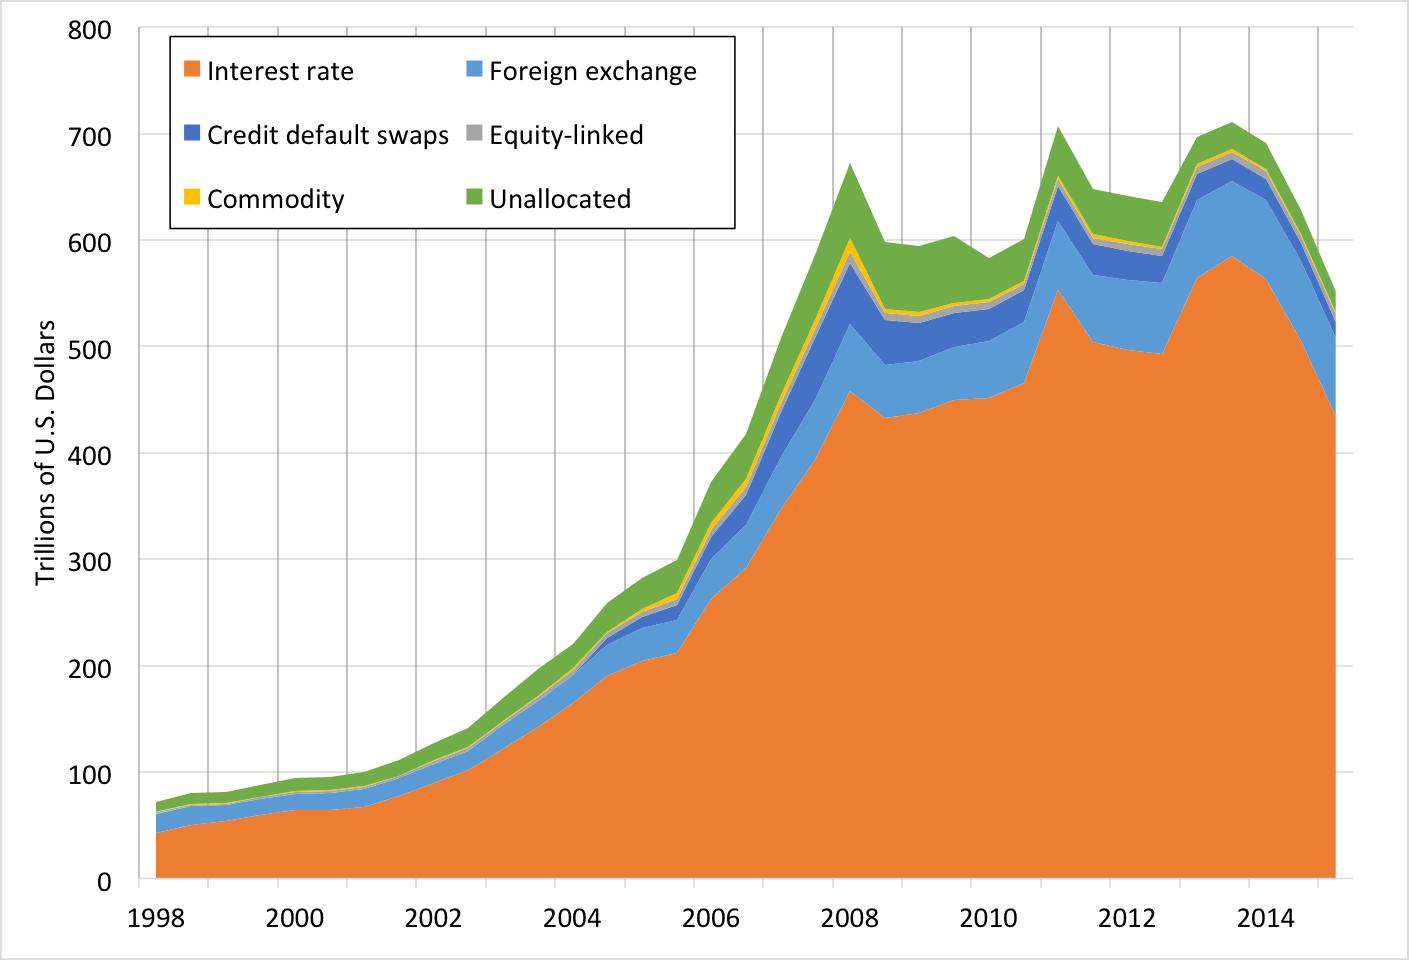 Source: BIS semiannual derivatives statistics .